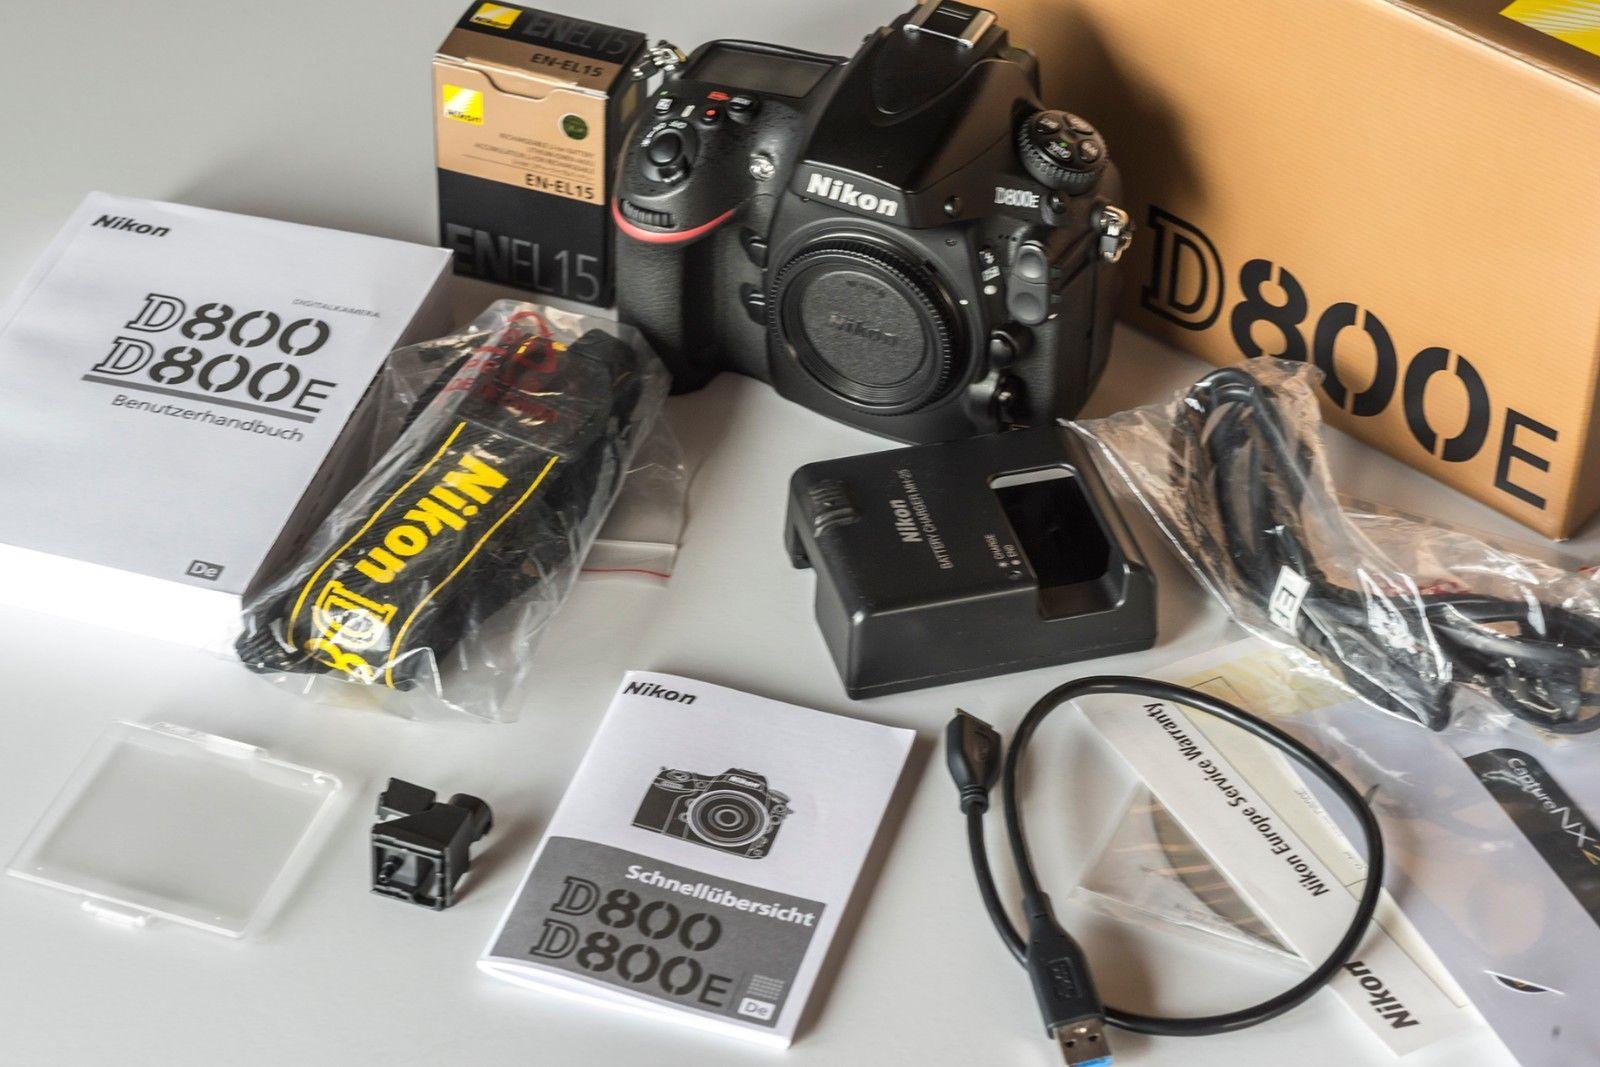 Nikon D800E Digitalkamera Gehäuse Body Shuttercount Ausl. unter 36000